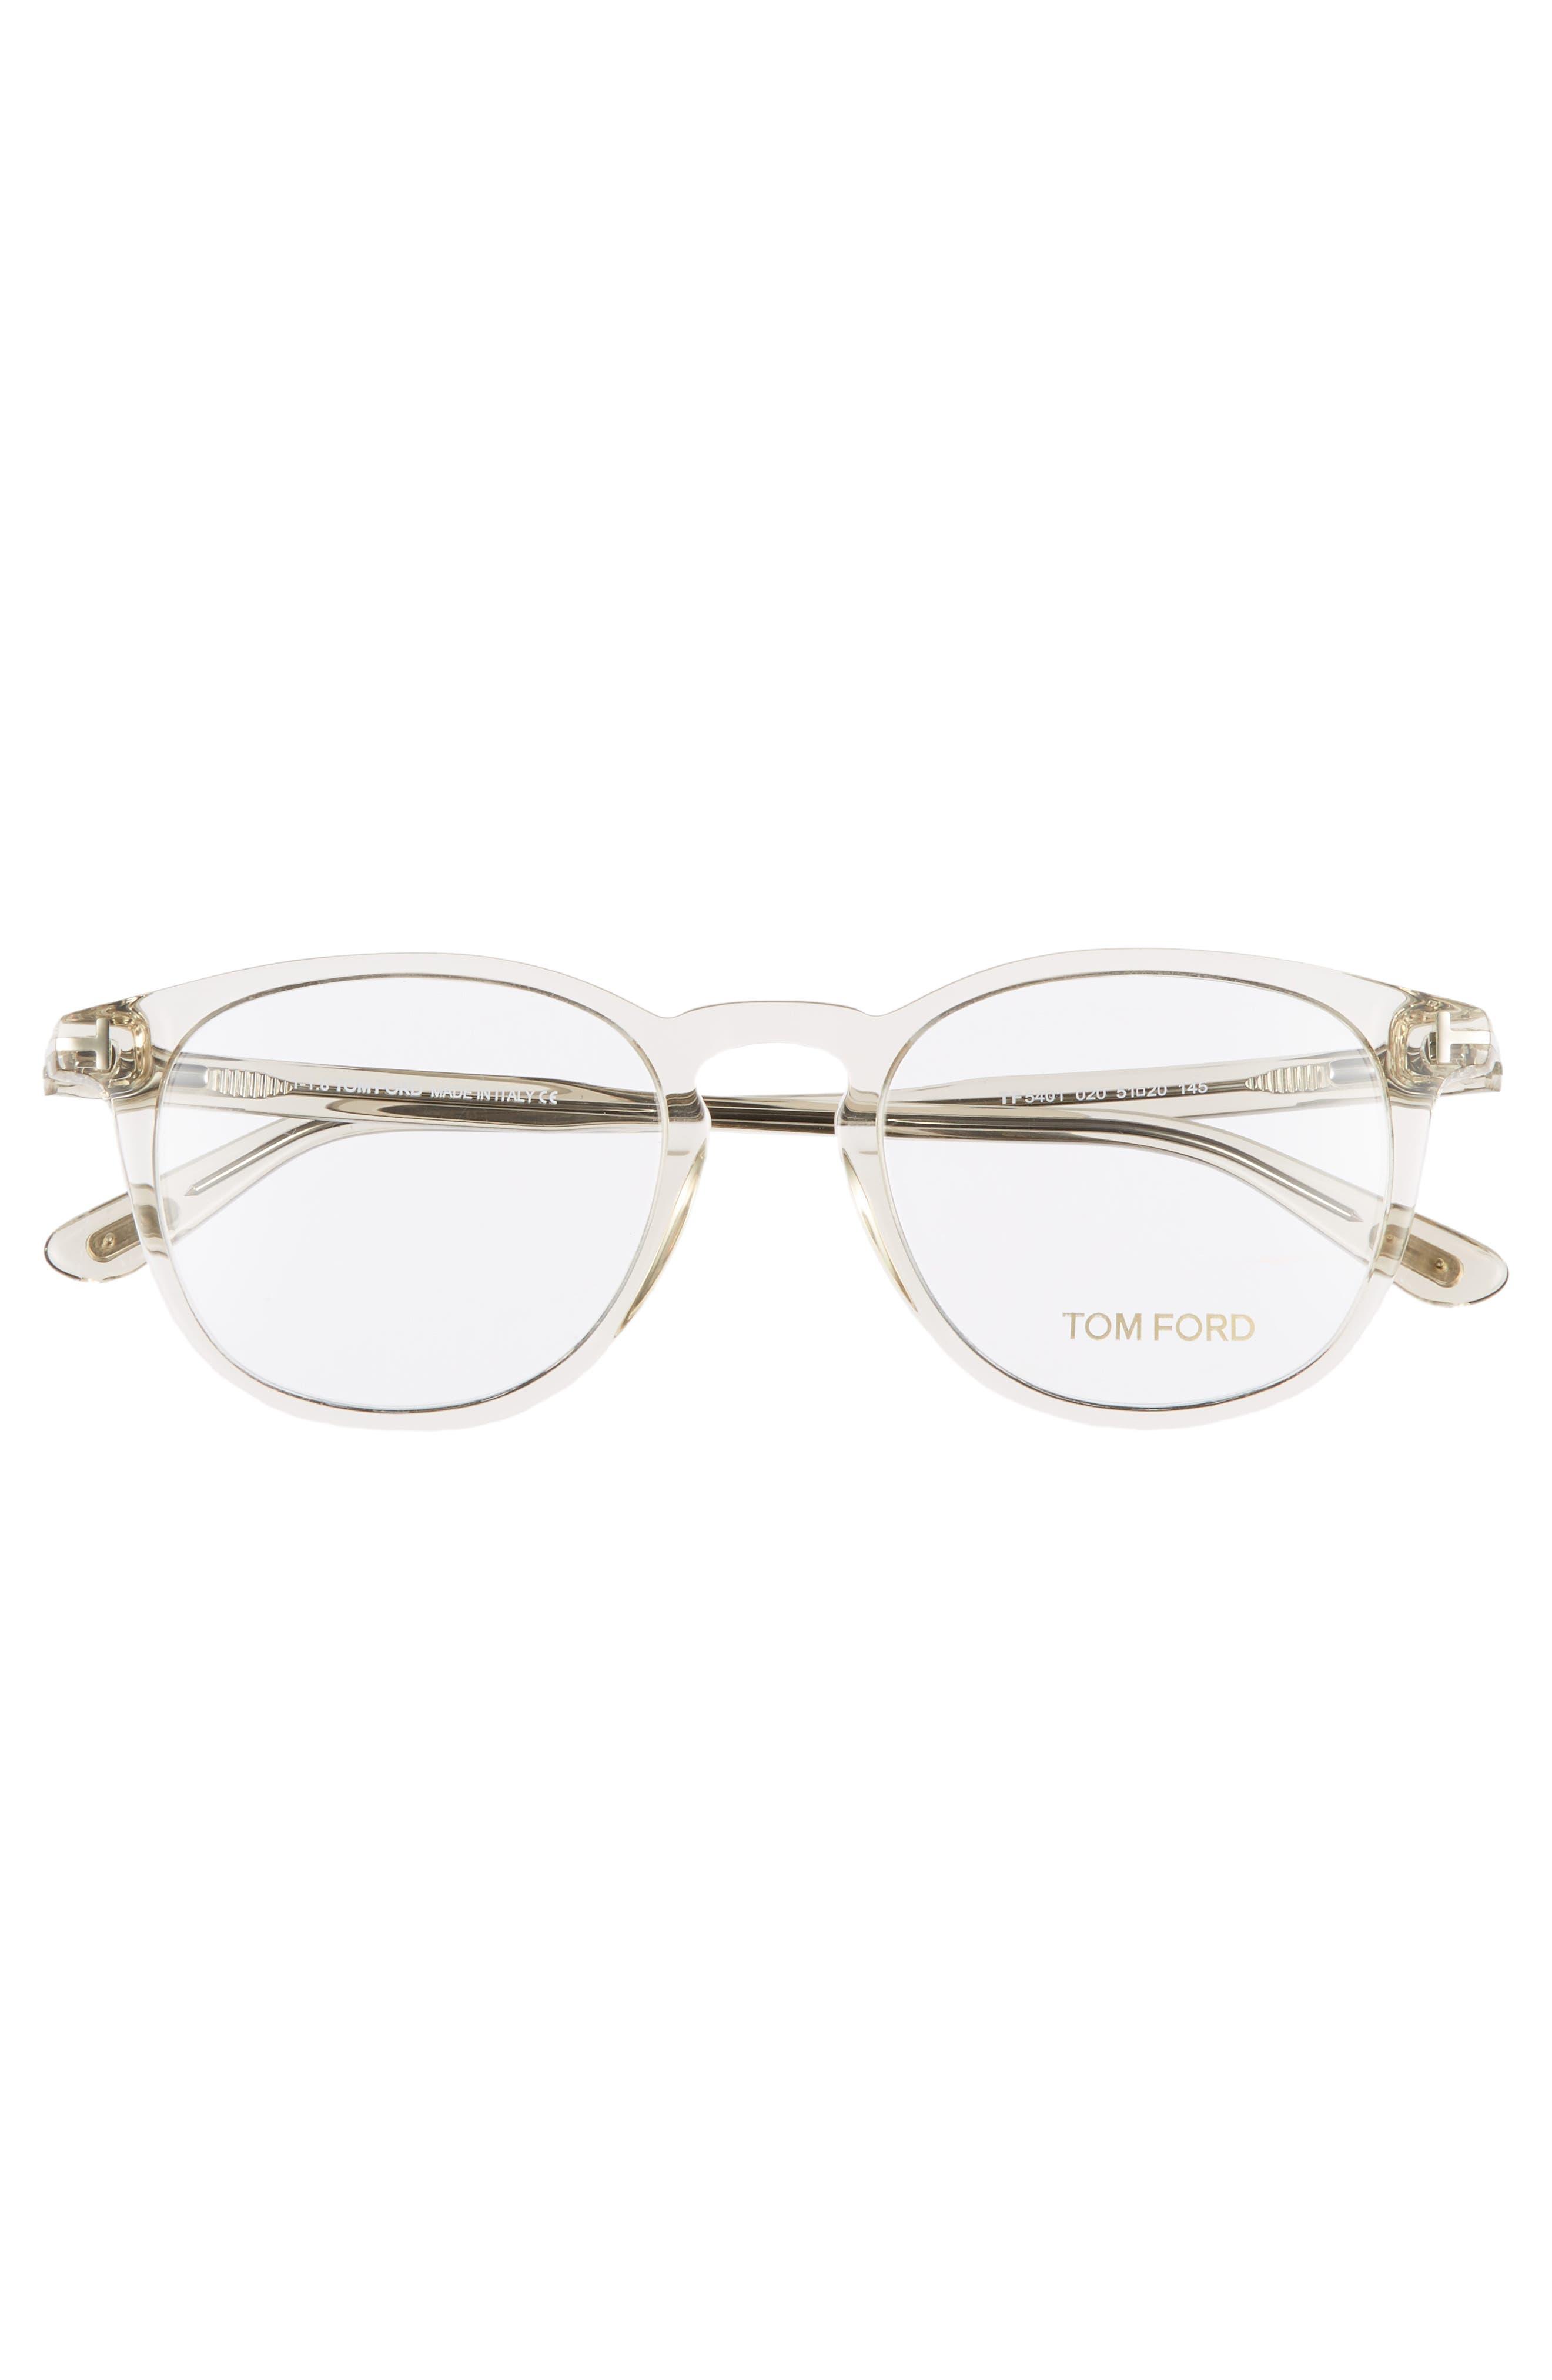 51mm Round Optical Glasses,                             Alternate thumbnail 3, color,                             SHINY TRANSPARENT GREY